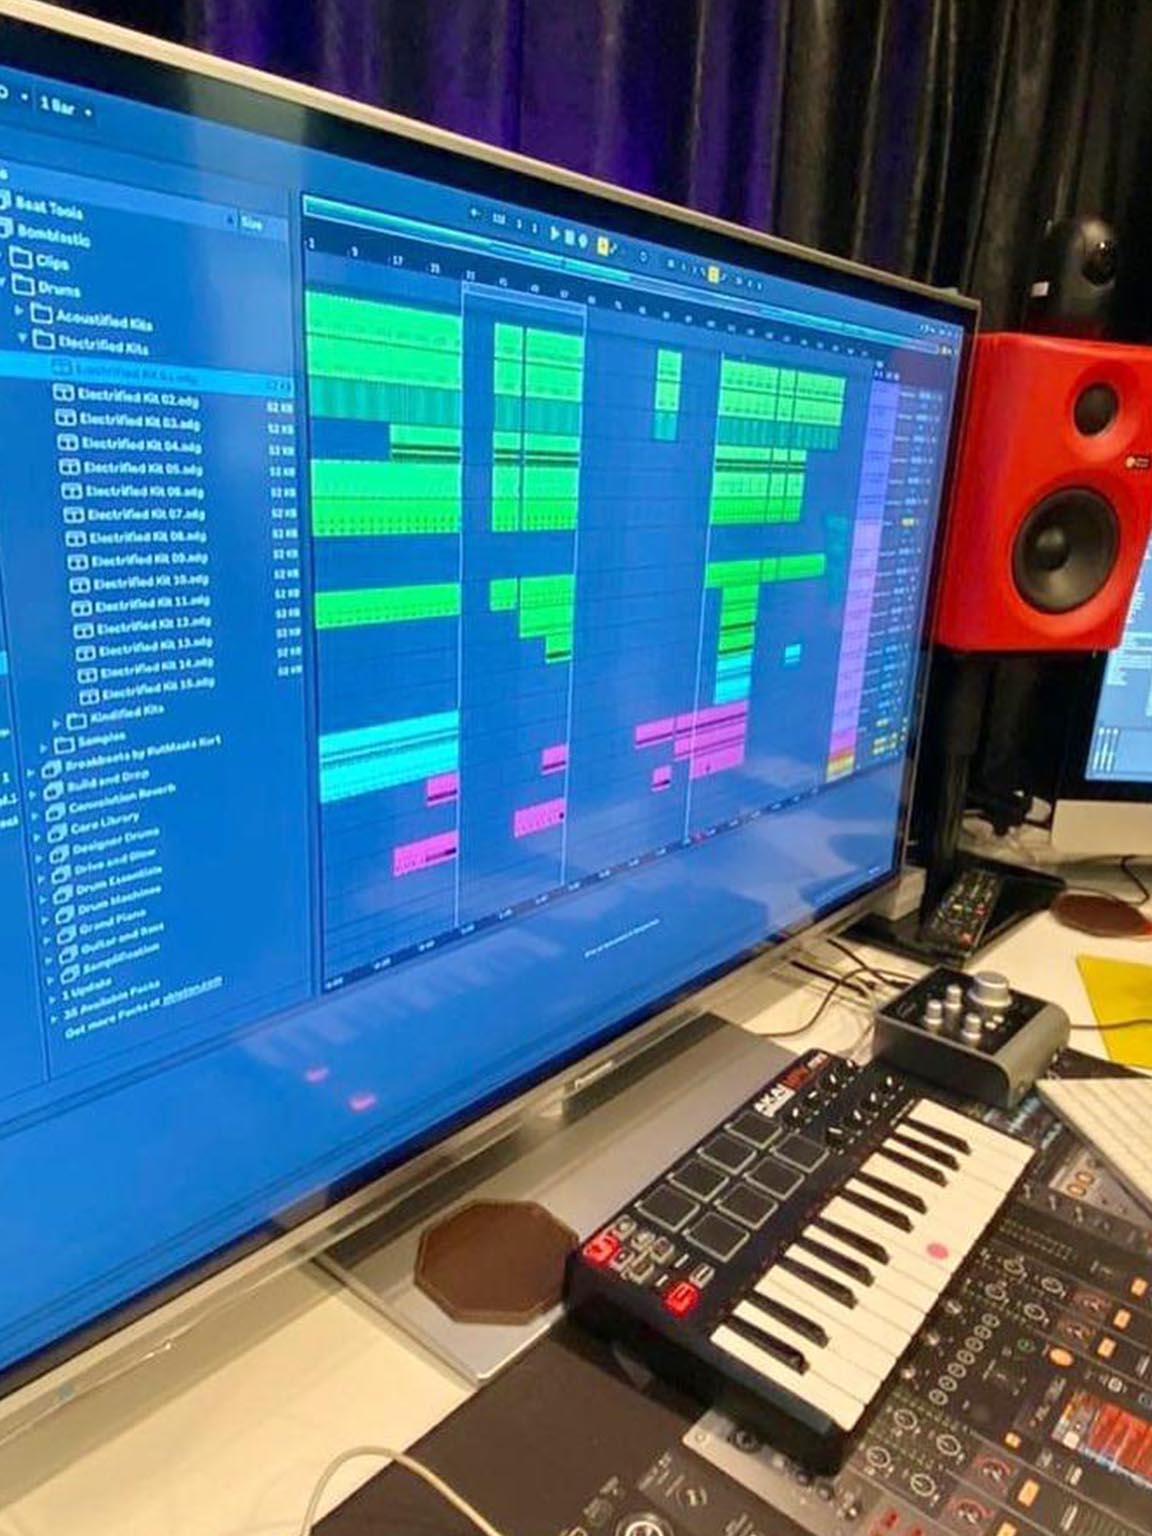 https://ministryofdjs.com.sg/wp-content/uploads/2021/06/Basic-Music-Prod-Revised.jpg